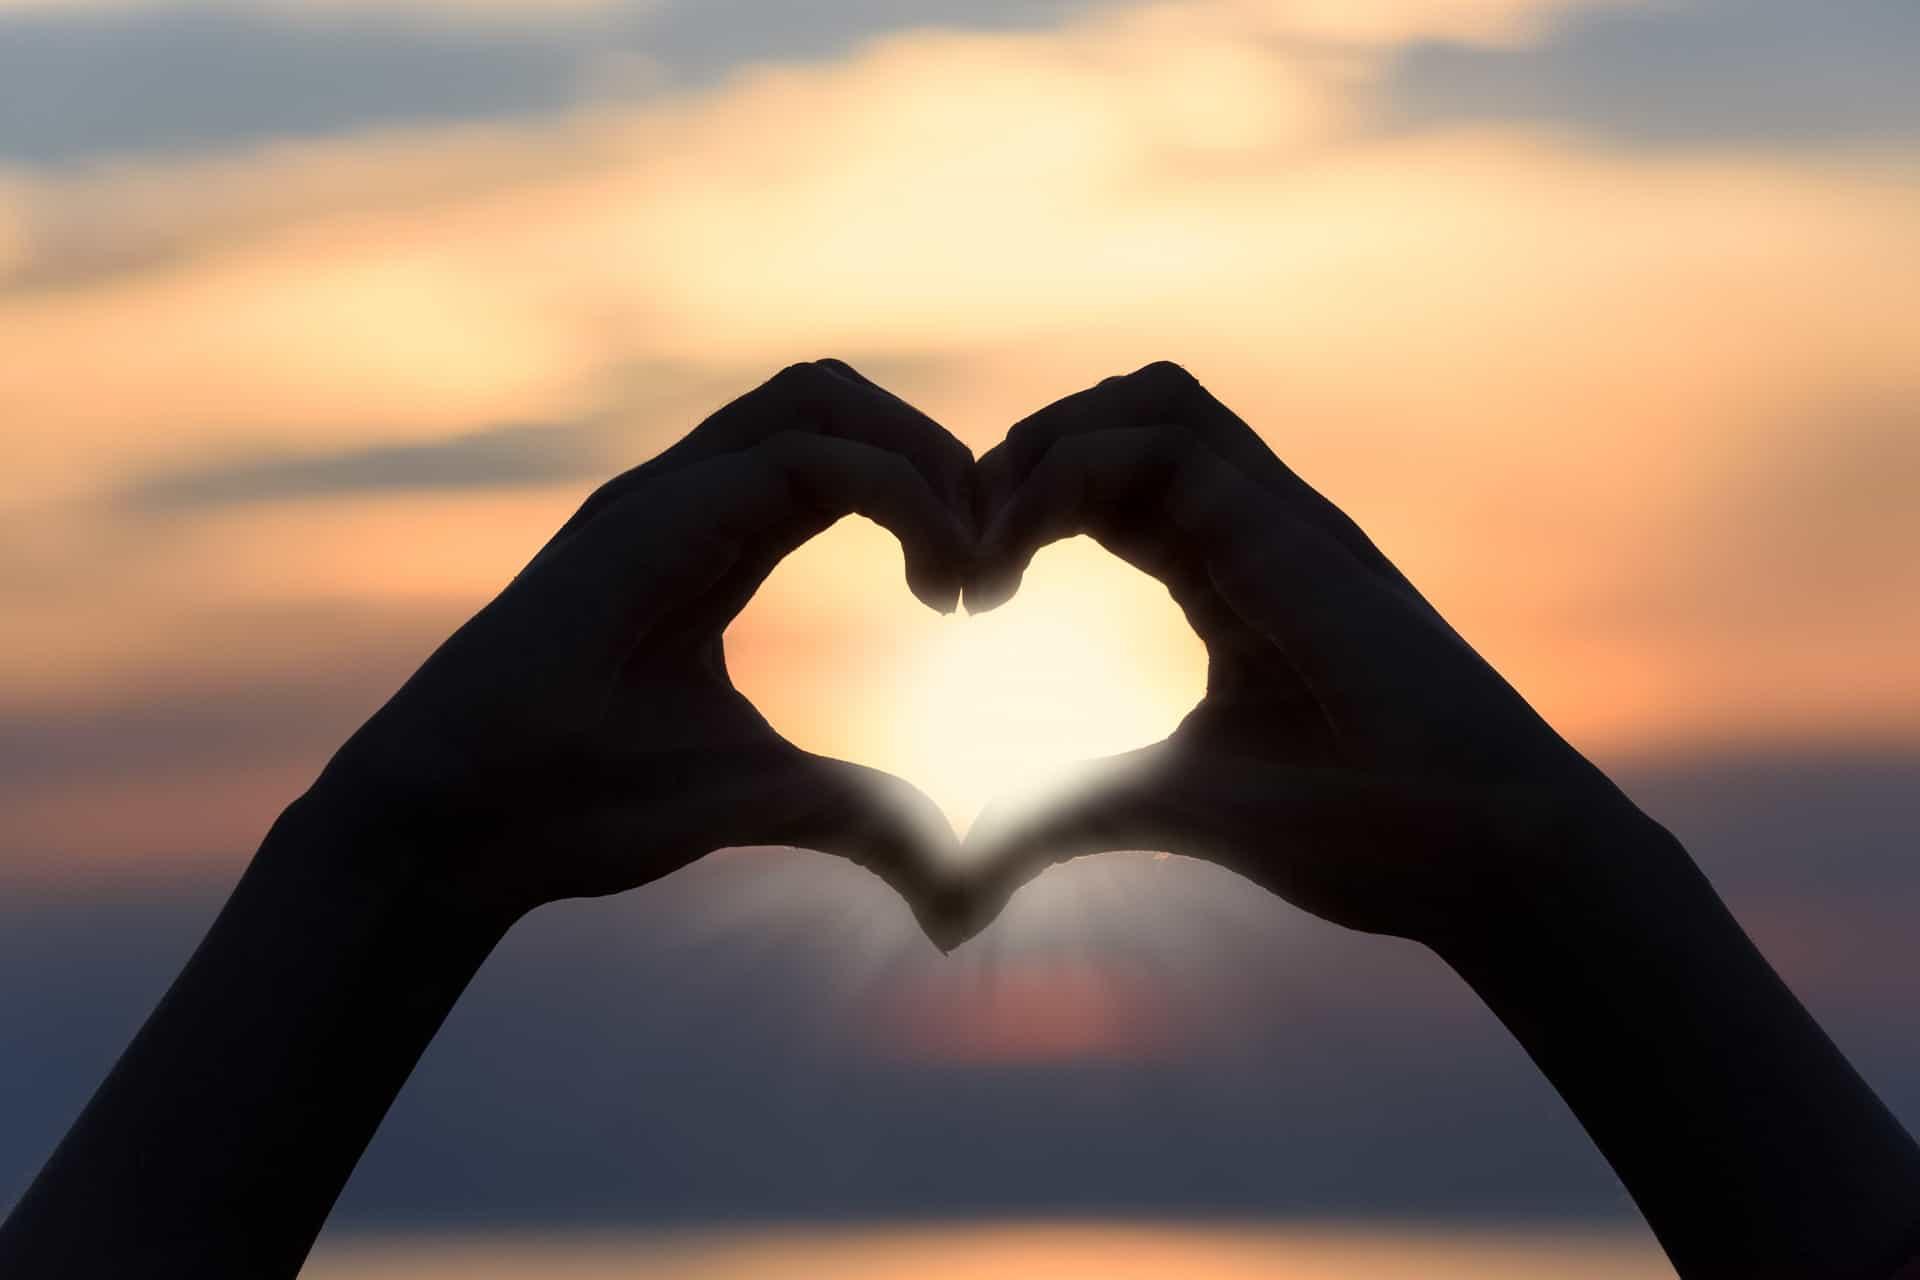 heart-3147976_1920 (1)